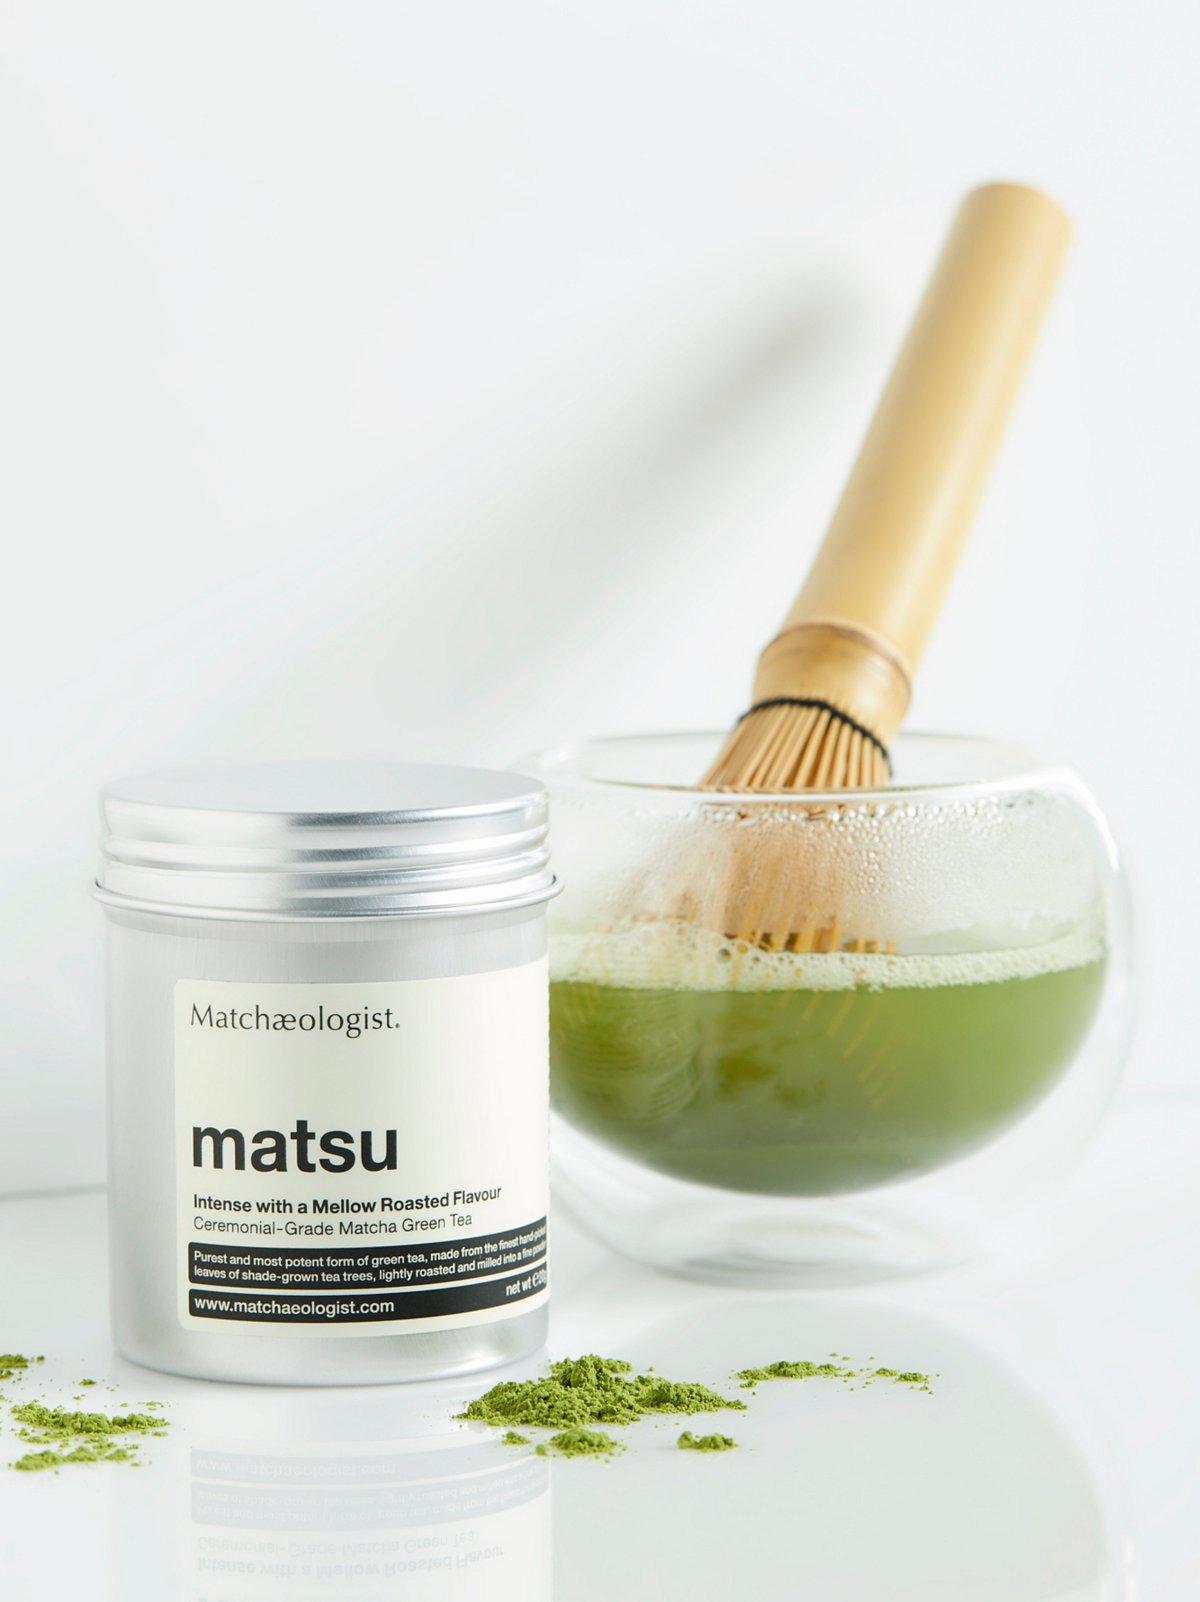 The Matcha Brewing Kit